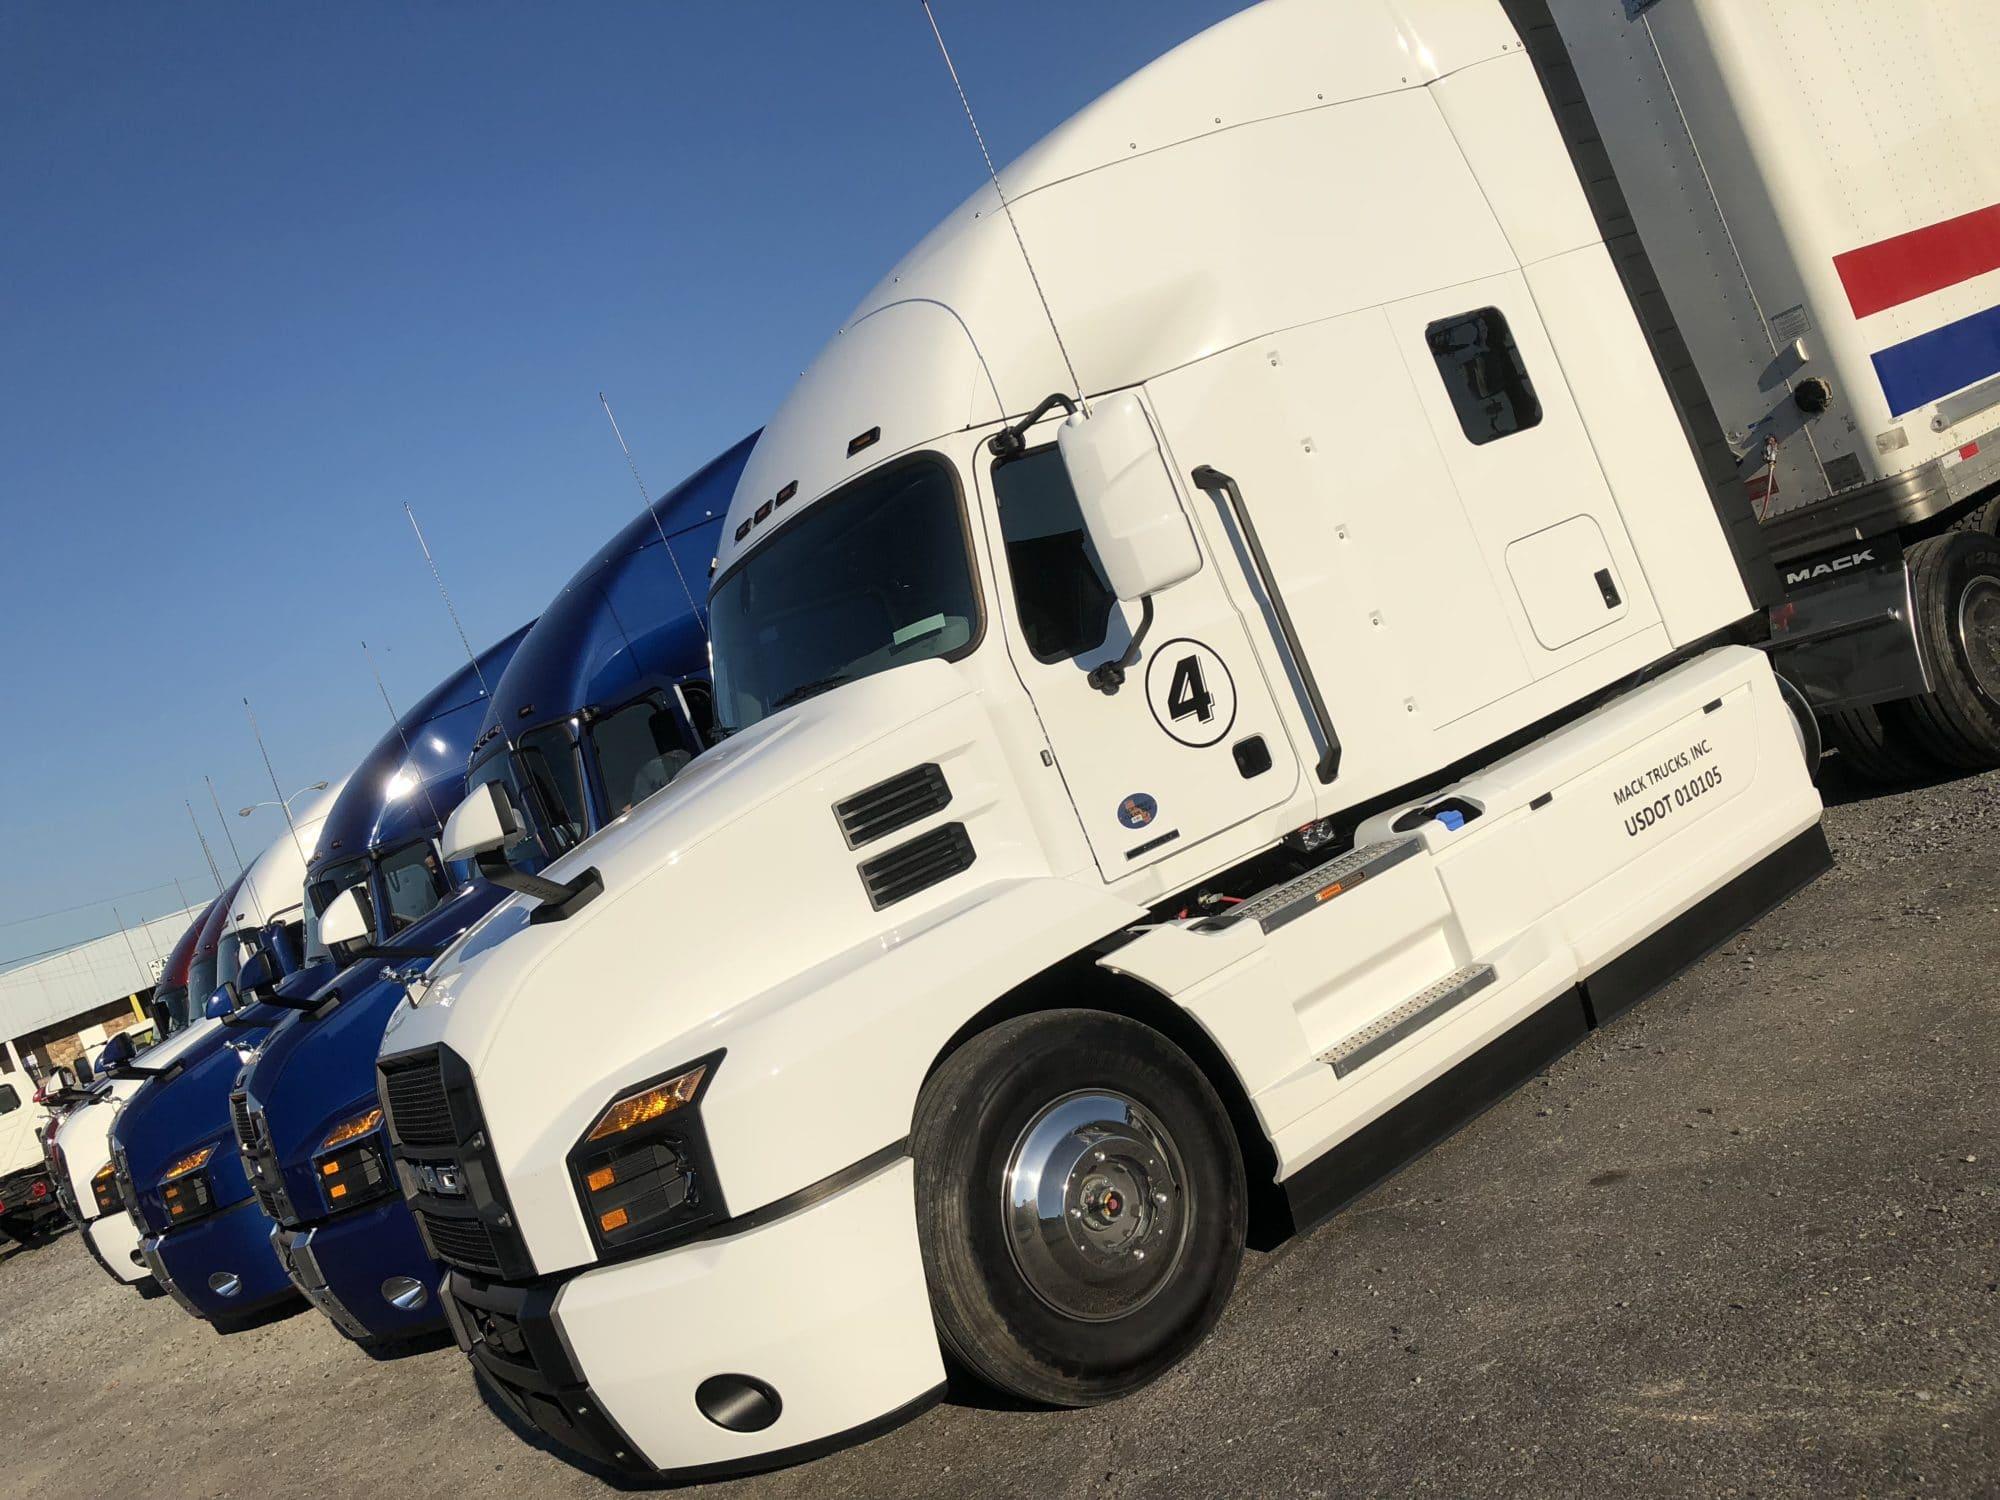 Chasing 10 mpg - Truck News